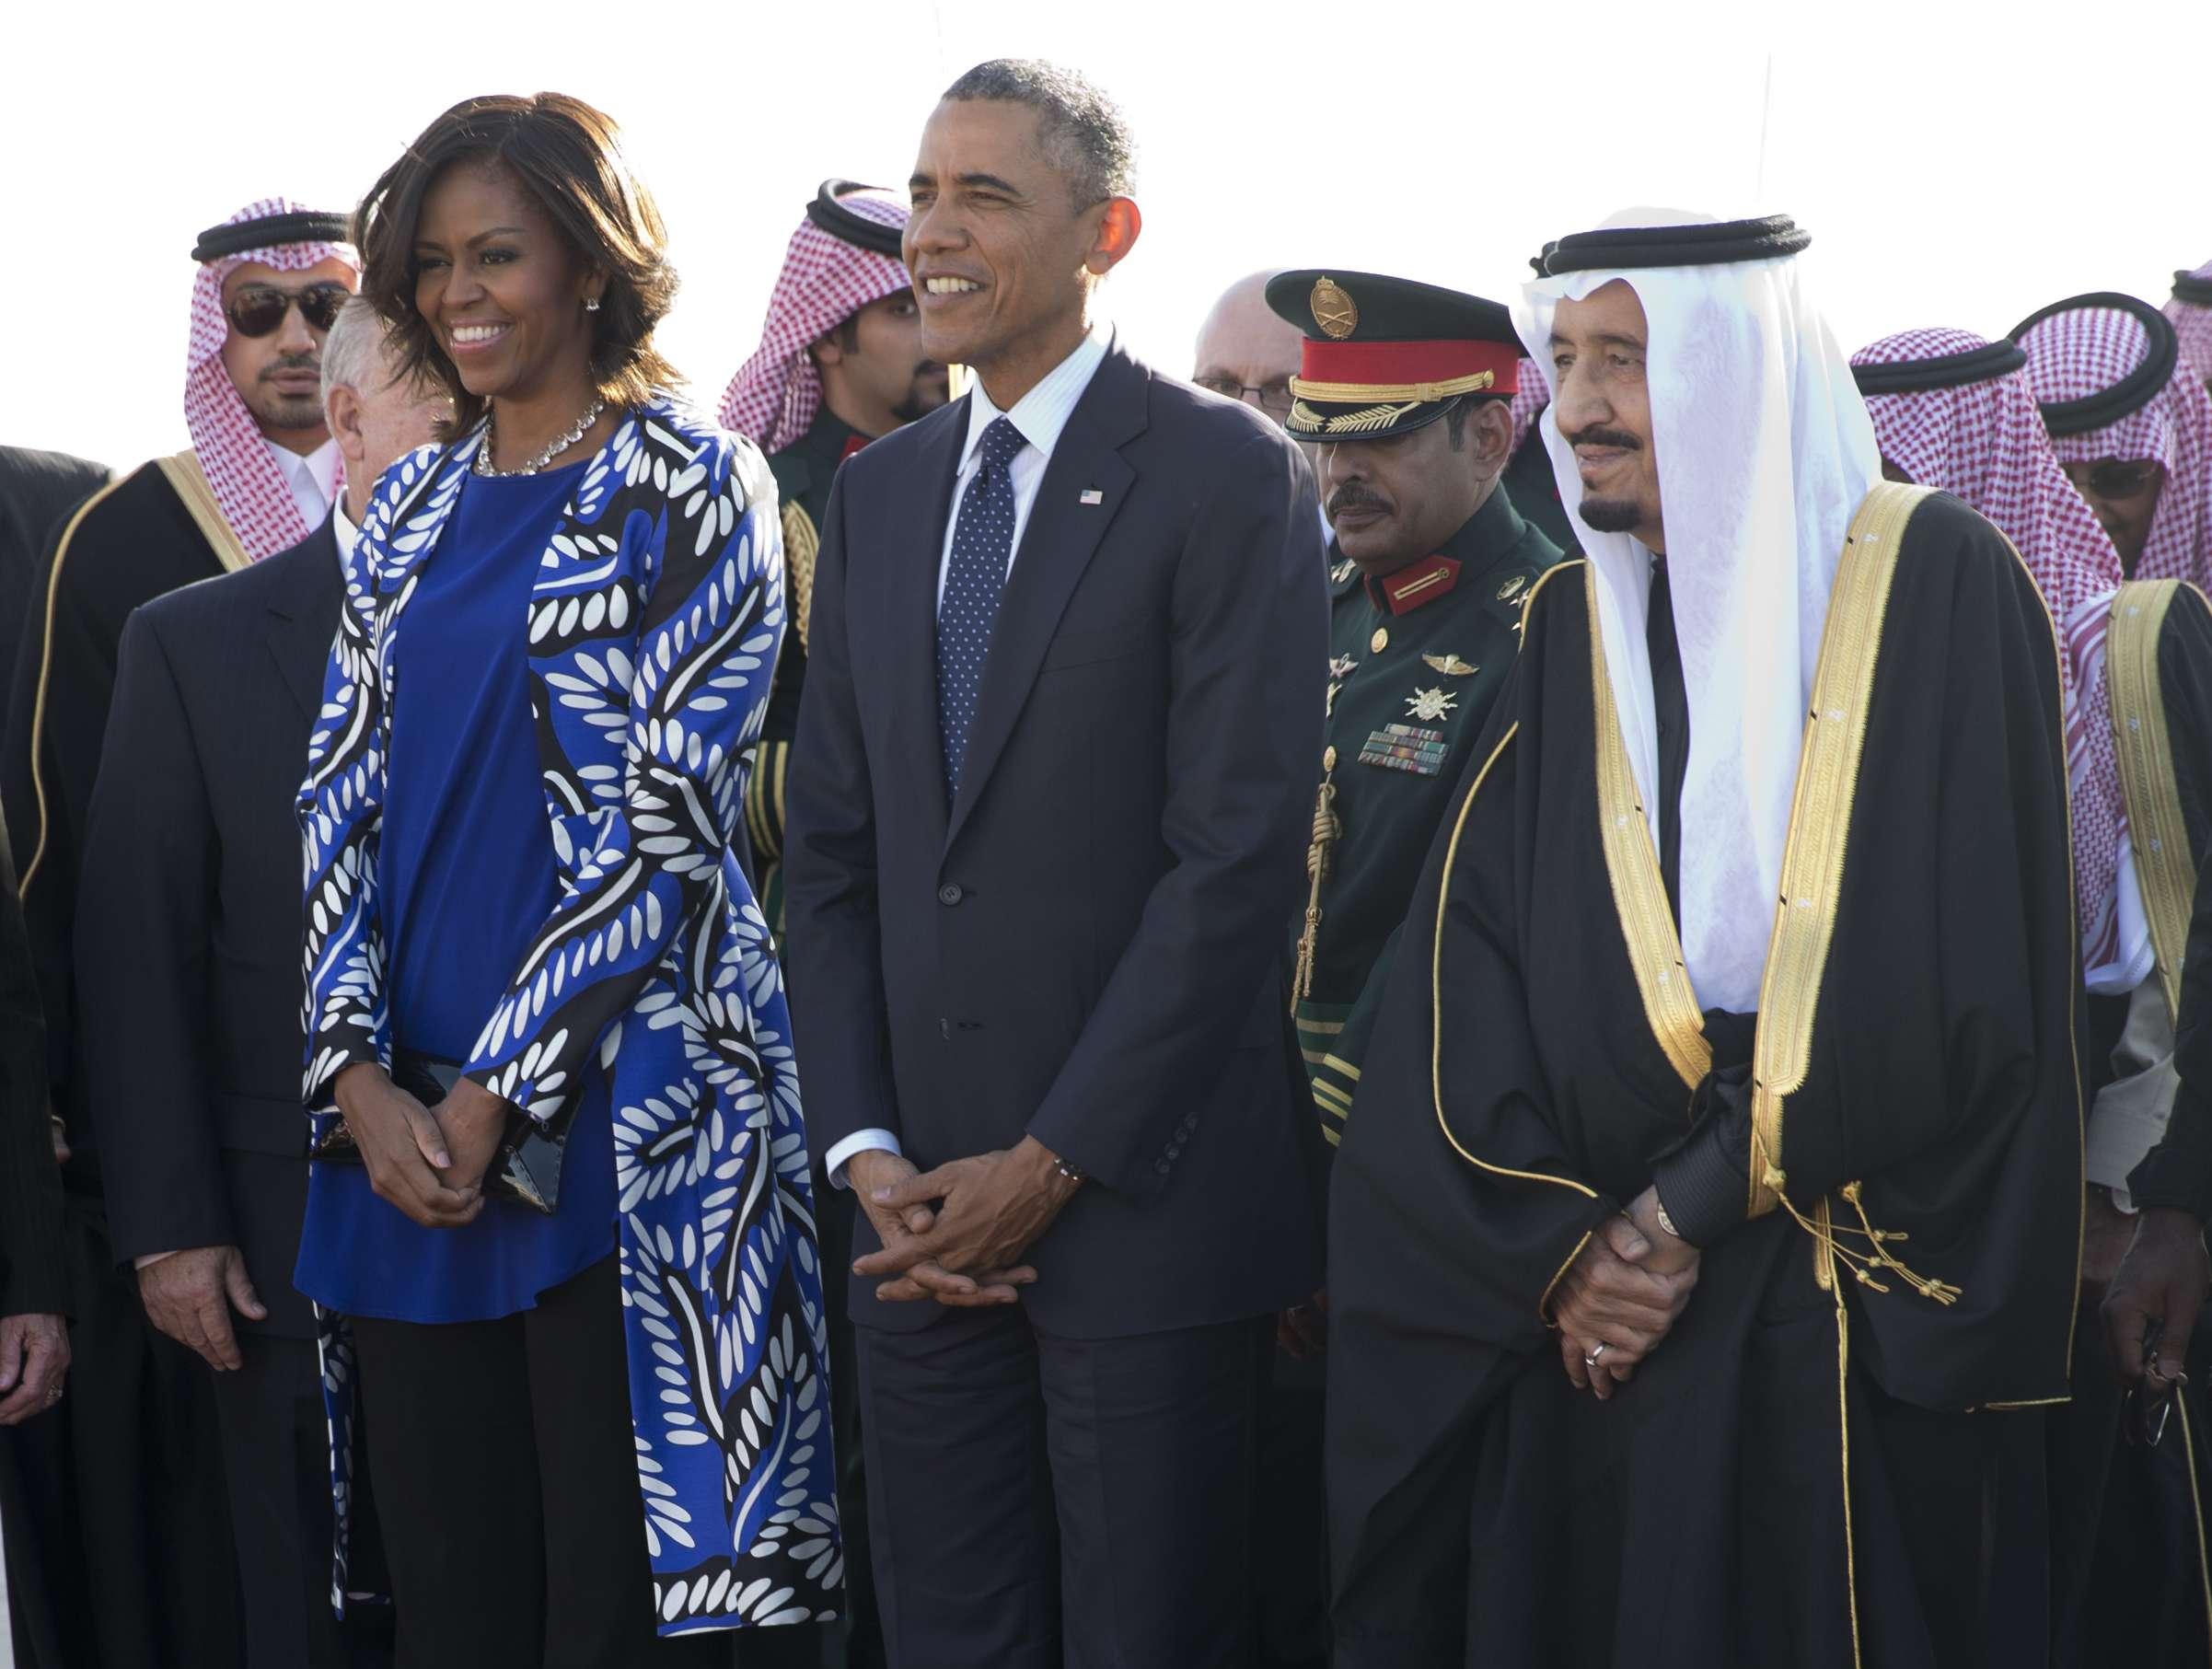 La etiqueta MichelleObamaSinVelo en árabe se usó 2.500 veces en Twitter. Foto: AP en español